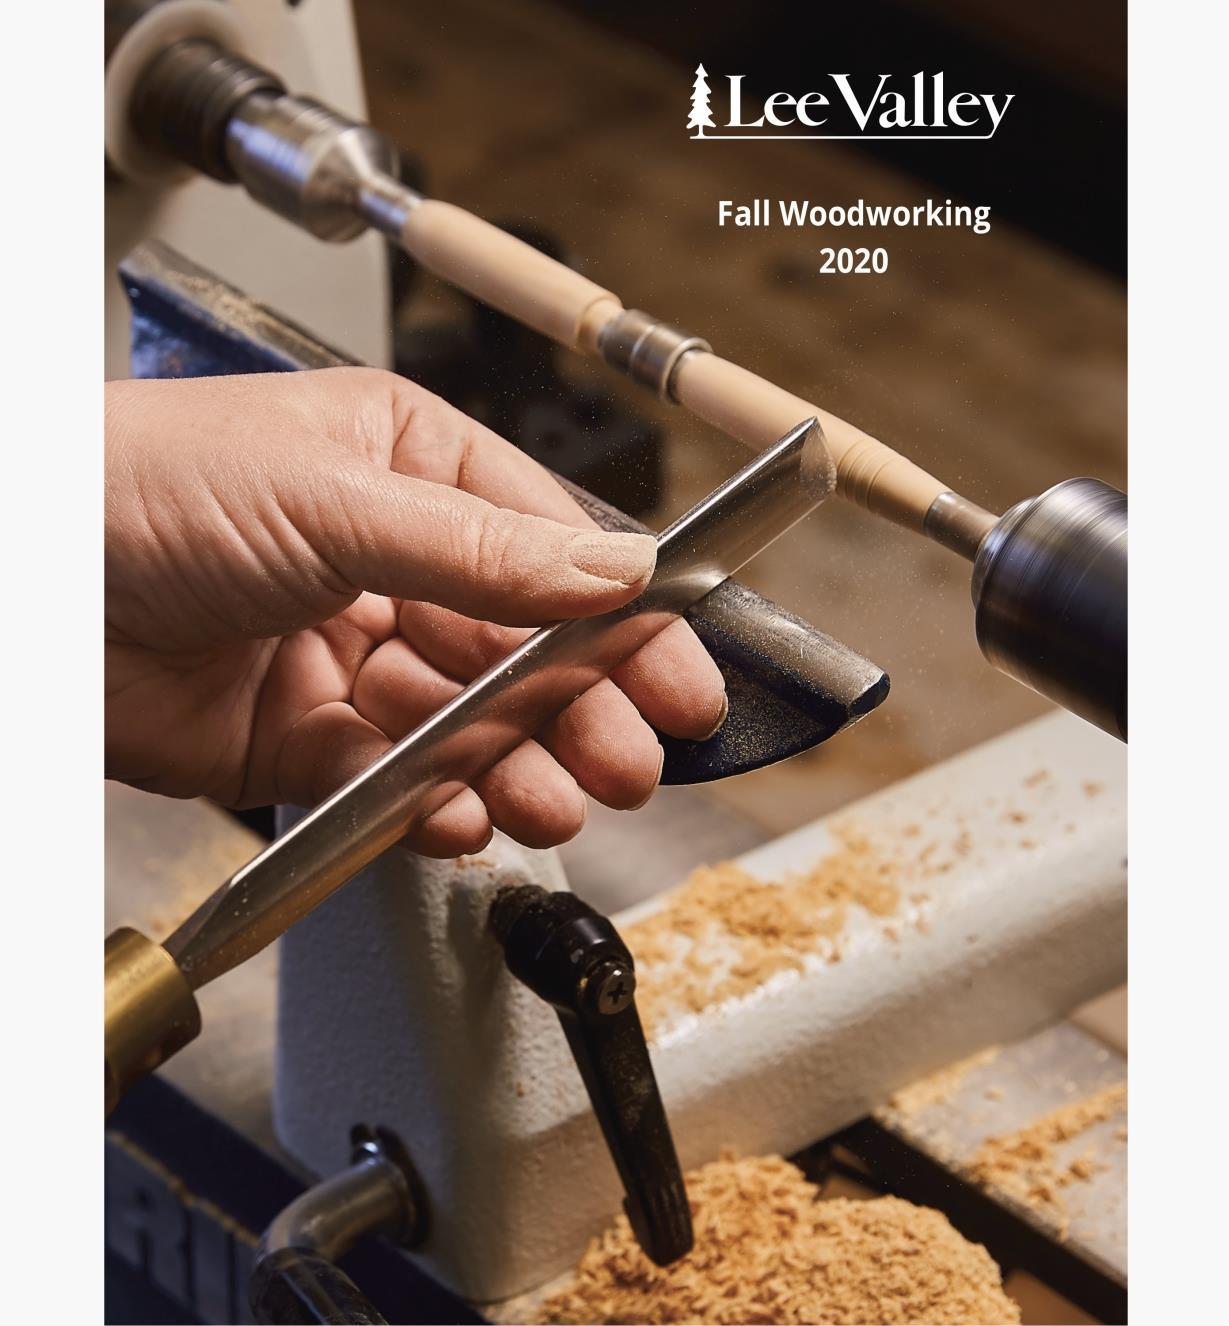 C1020W - Fall Woodworking 2020